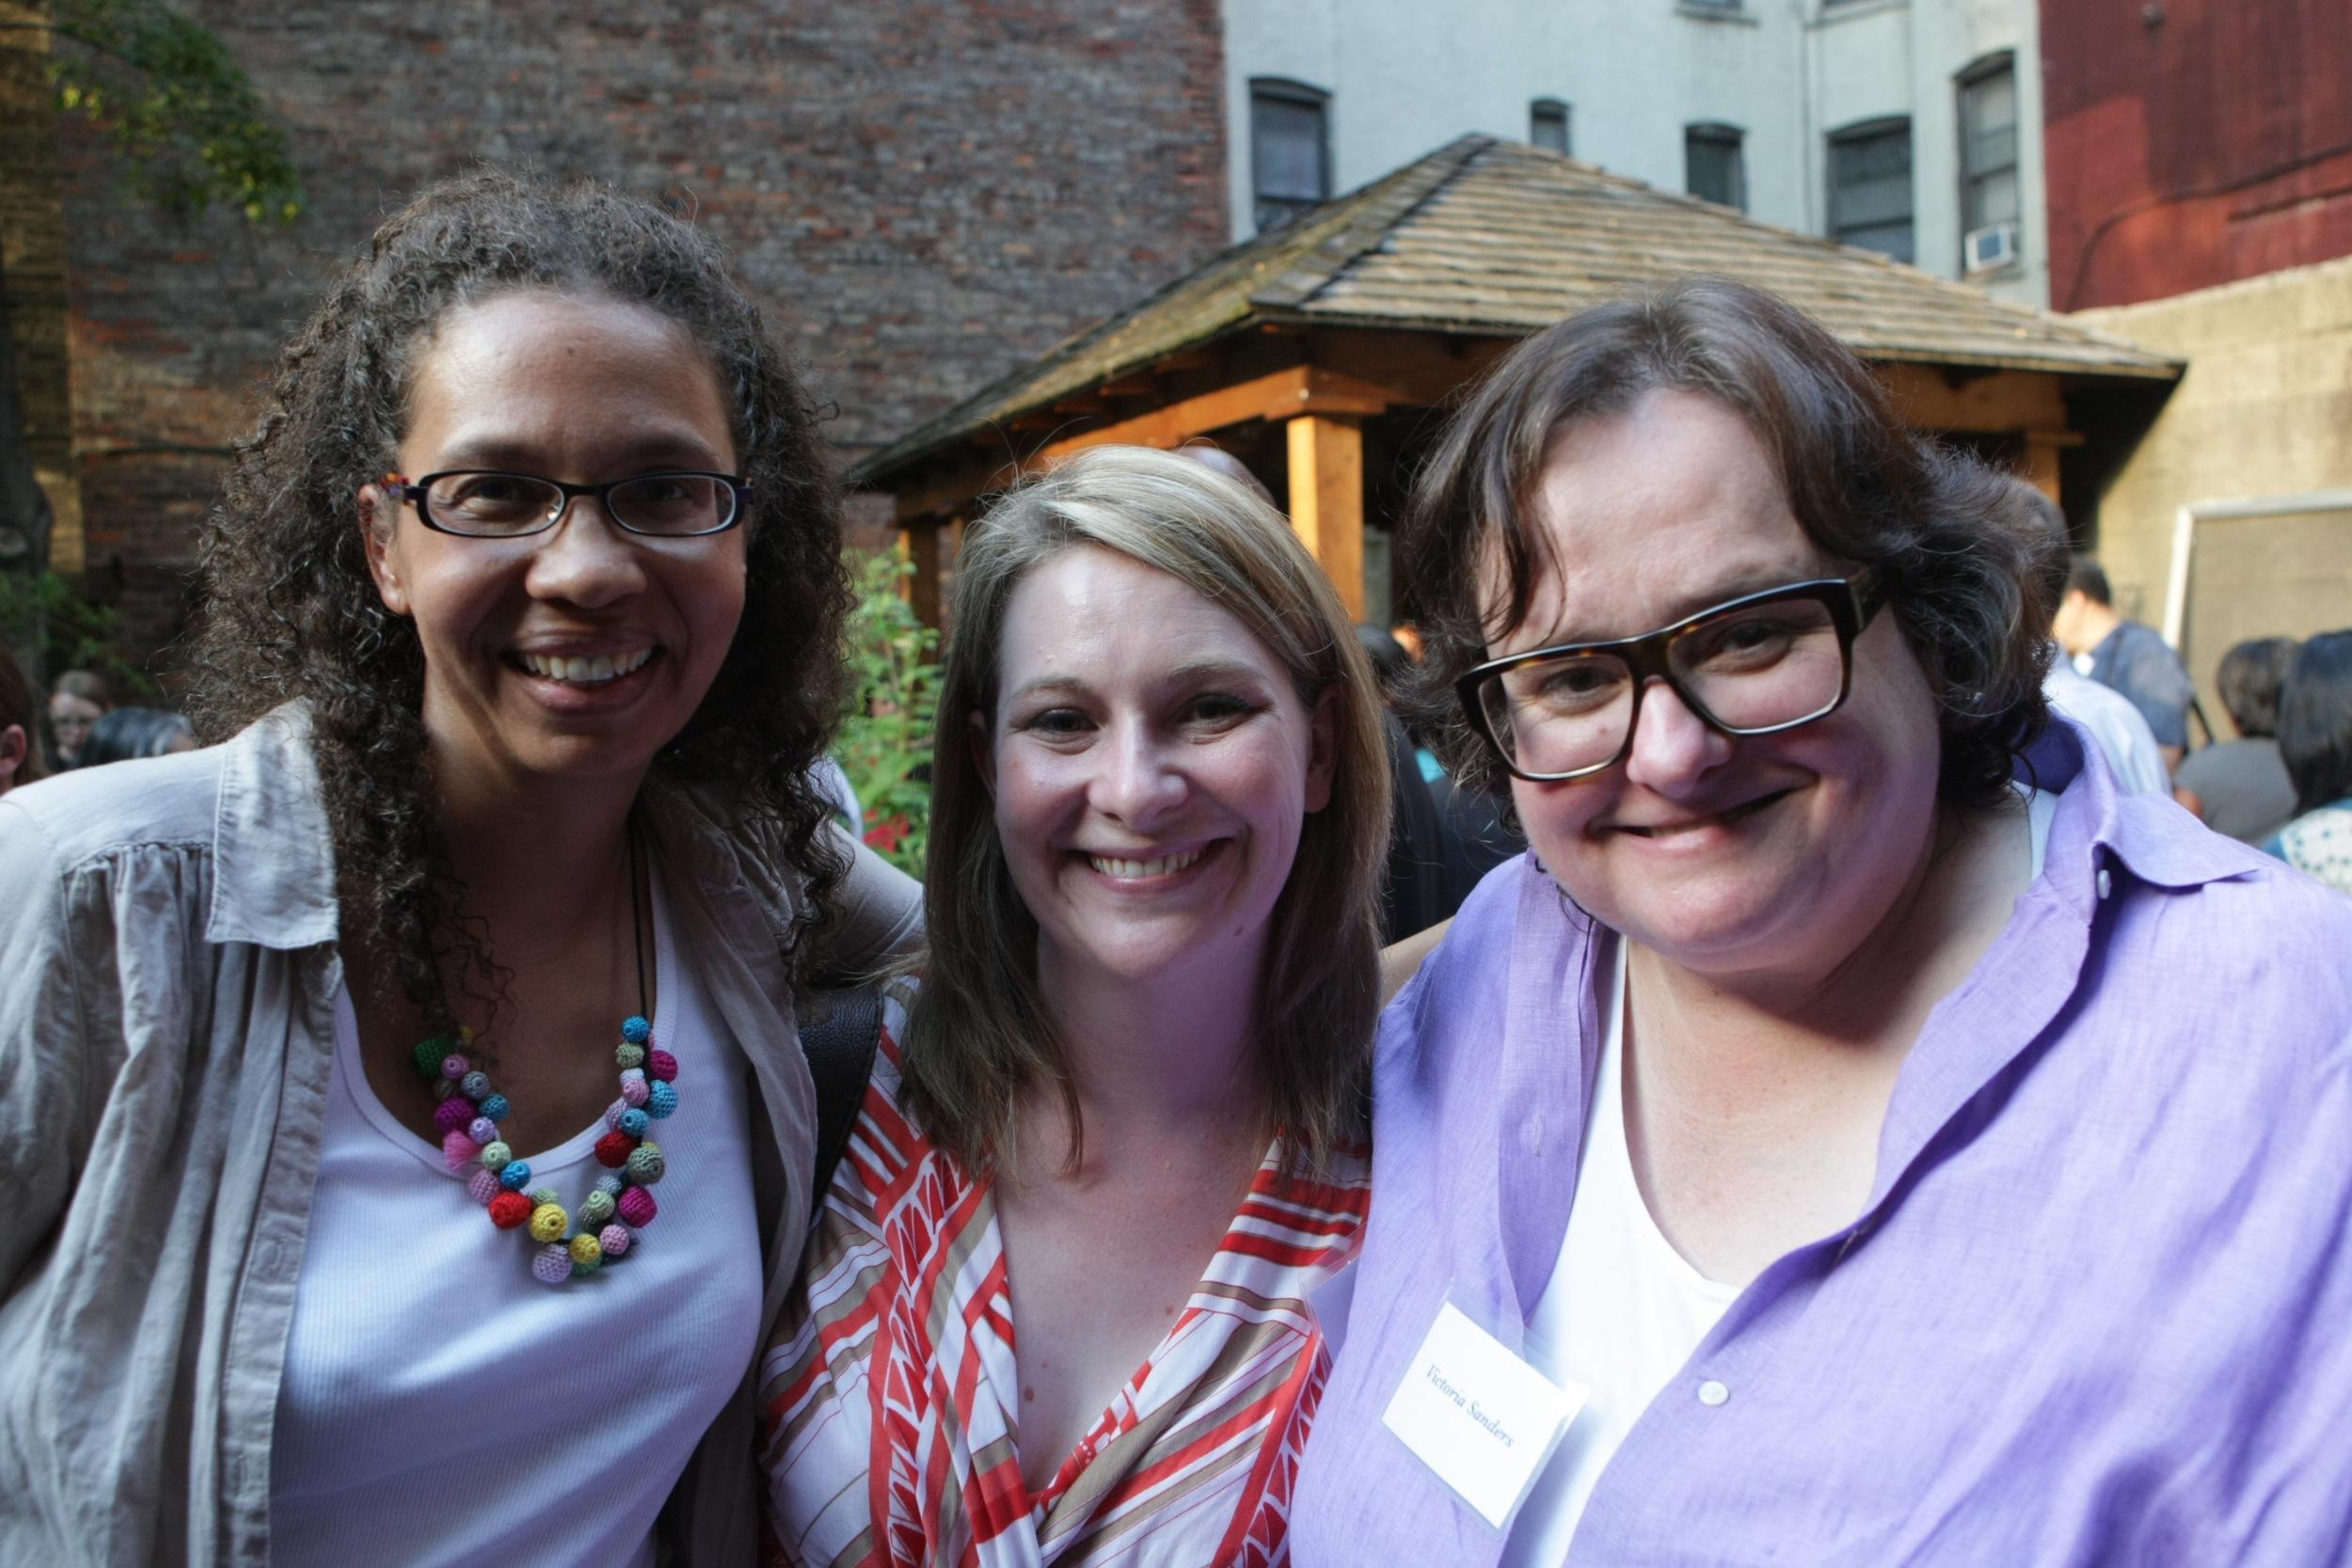 Tanya McKinnon, Bernadette Baker Baughman & Victoria Sanders